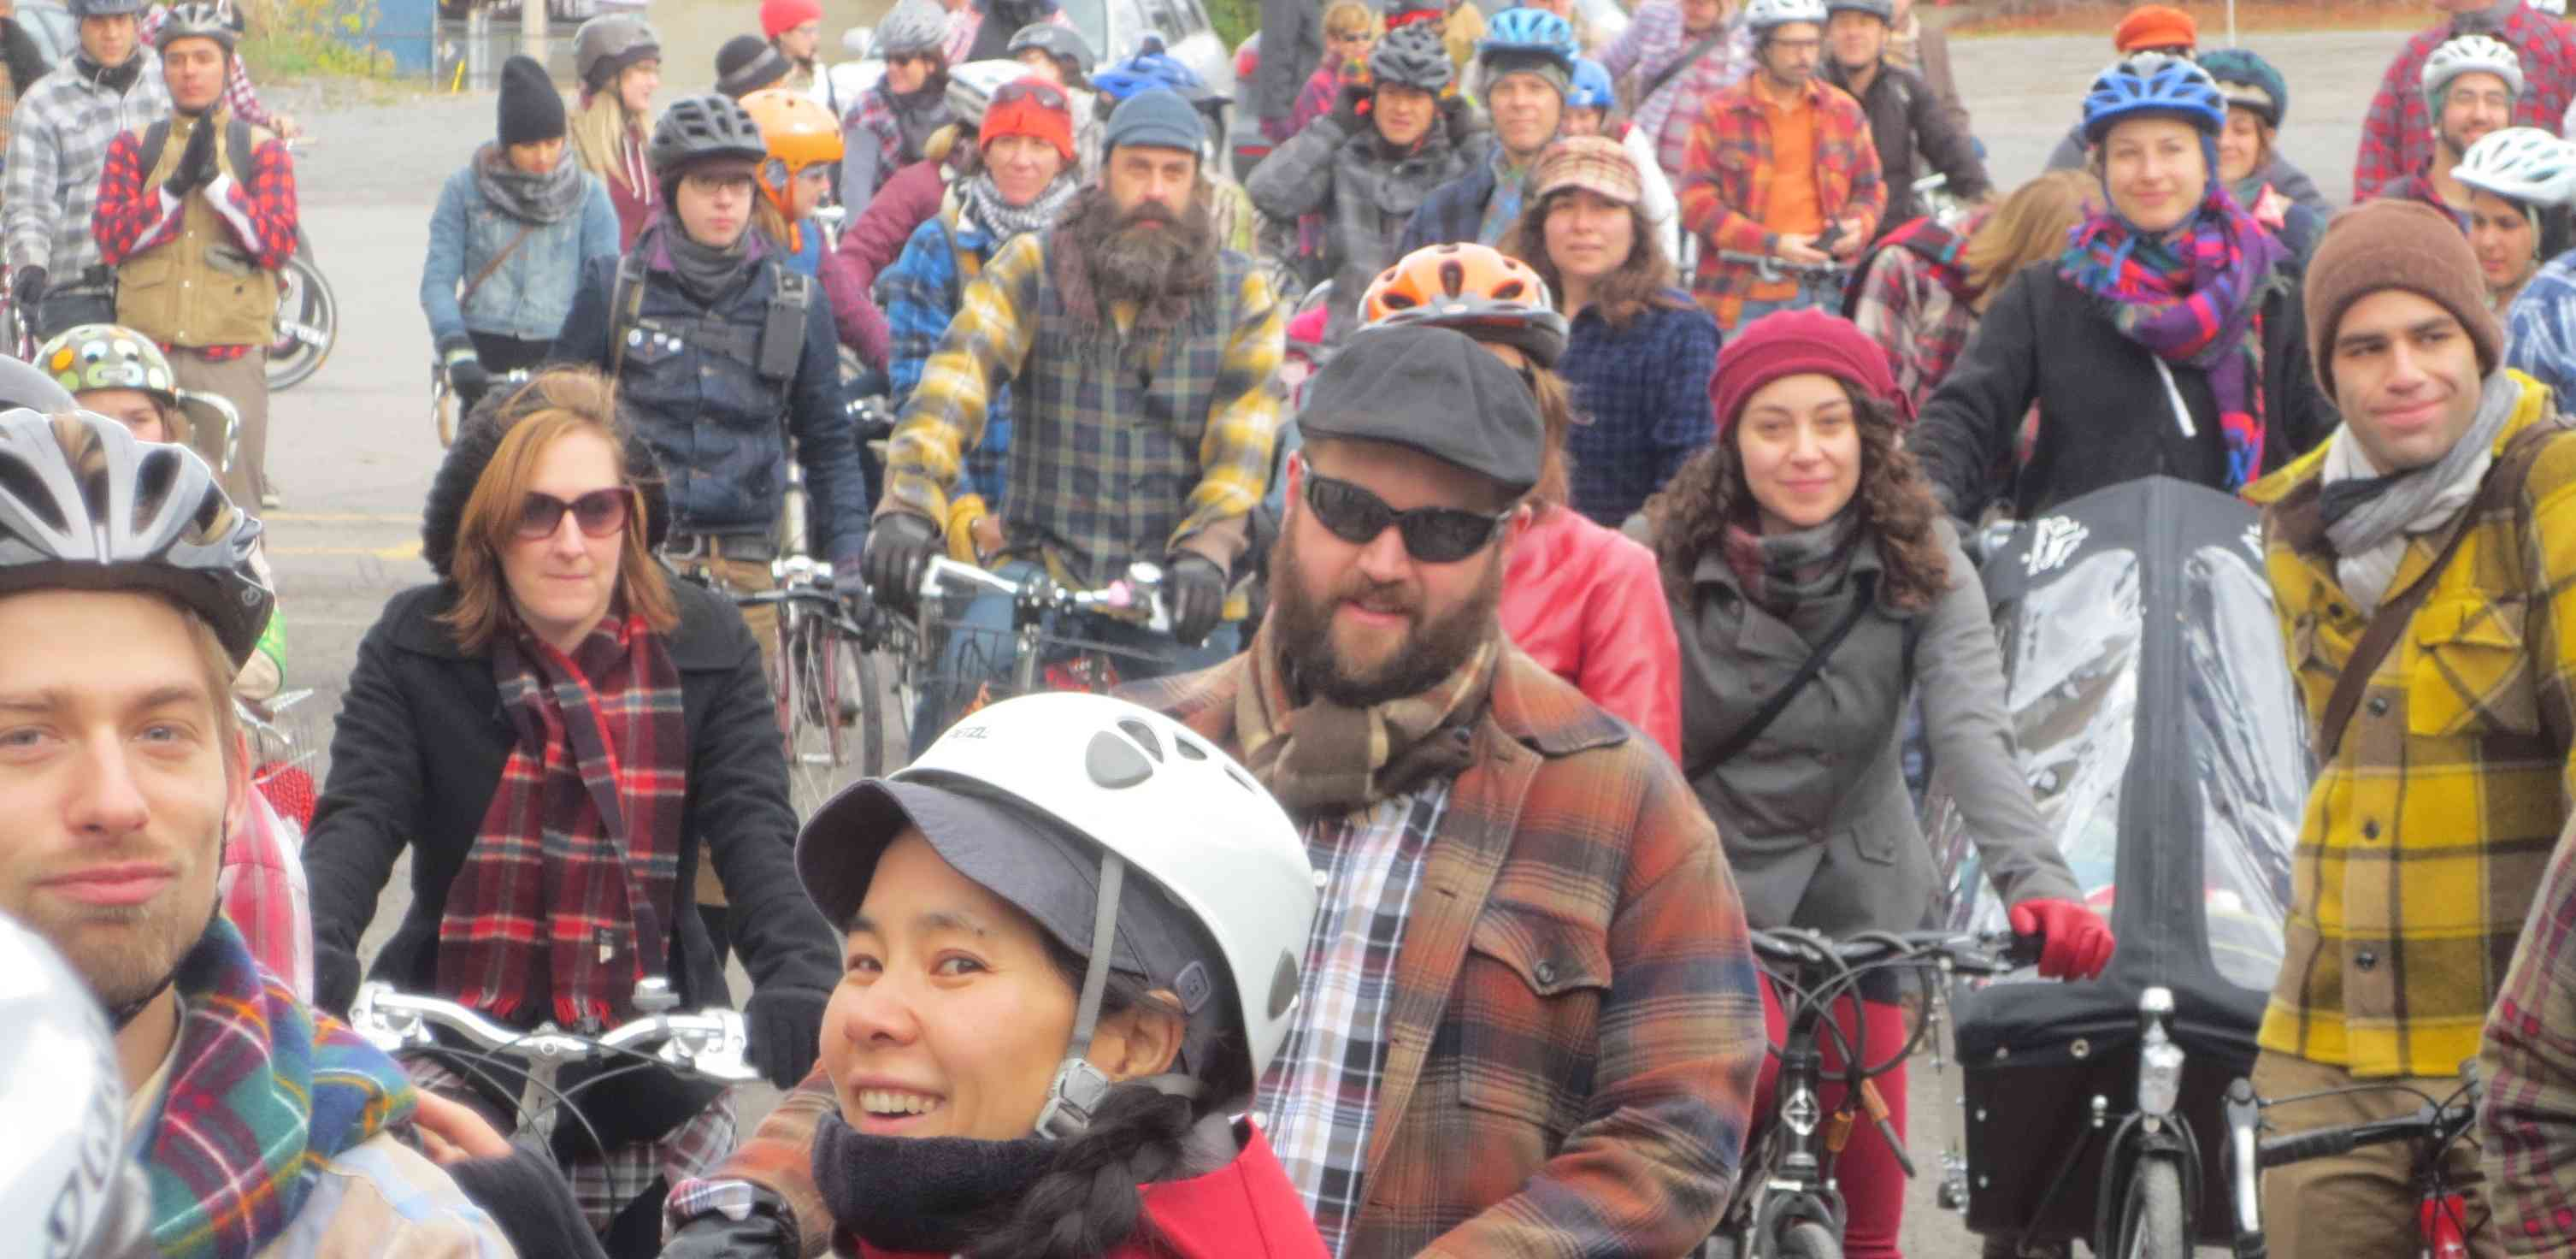 2013 10 27 Ottawa Plaid Parade – Hans Moor 20